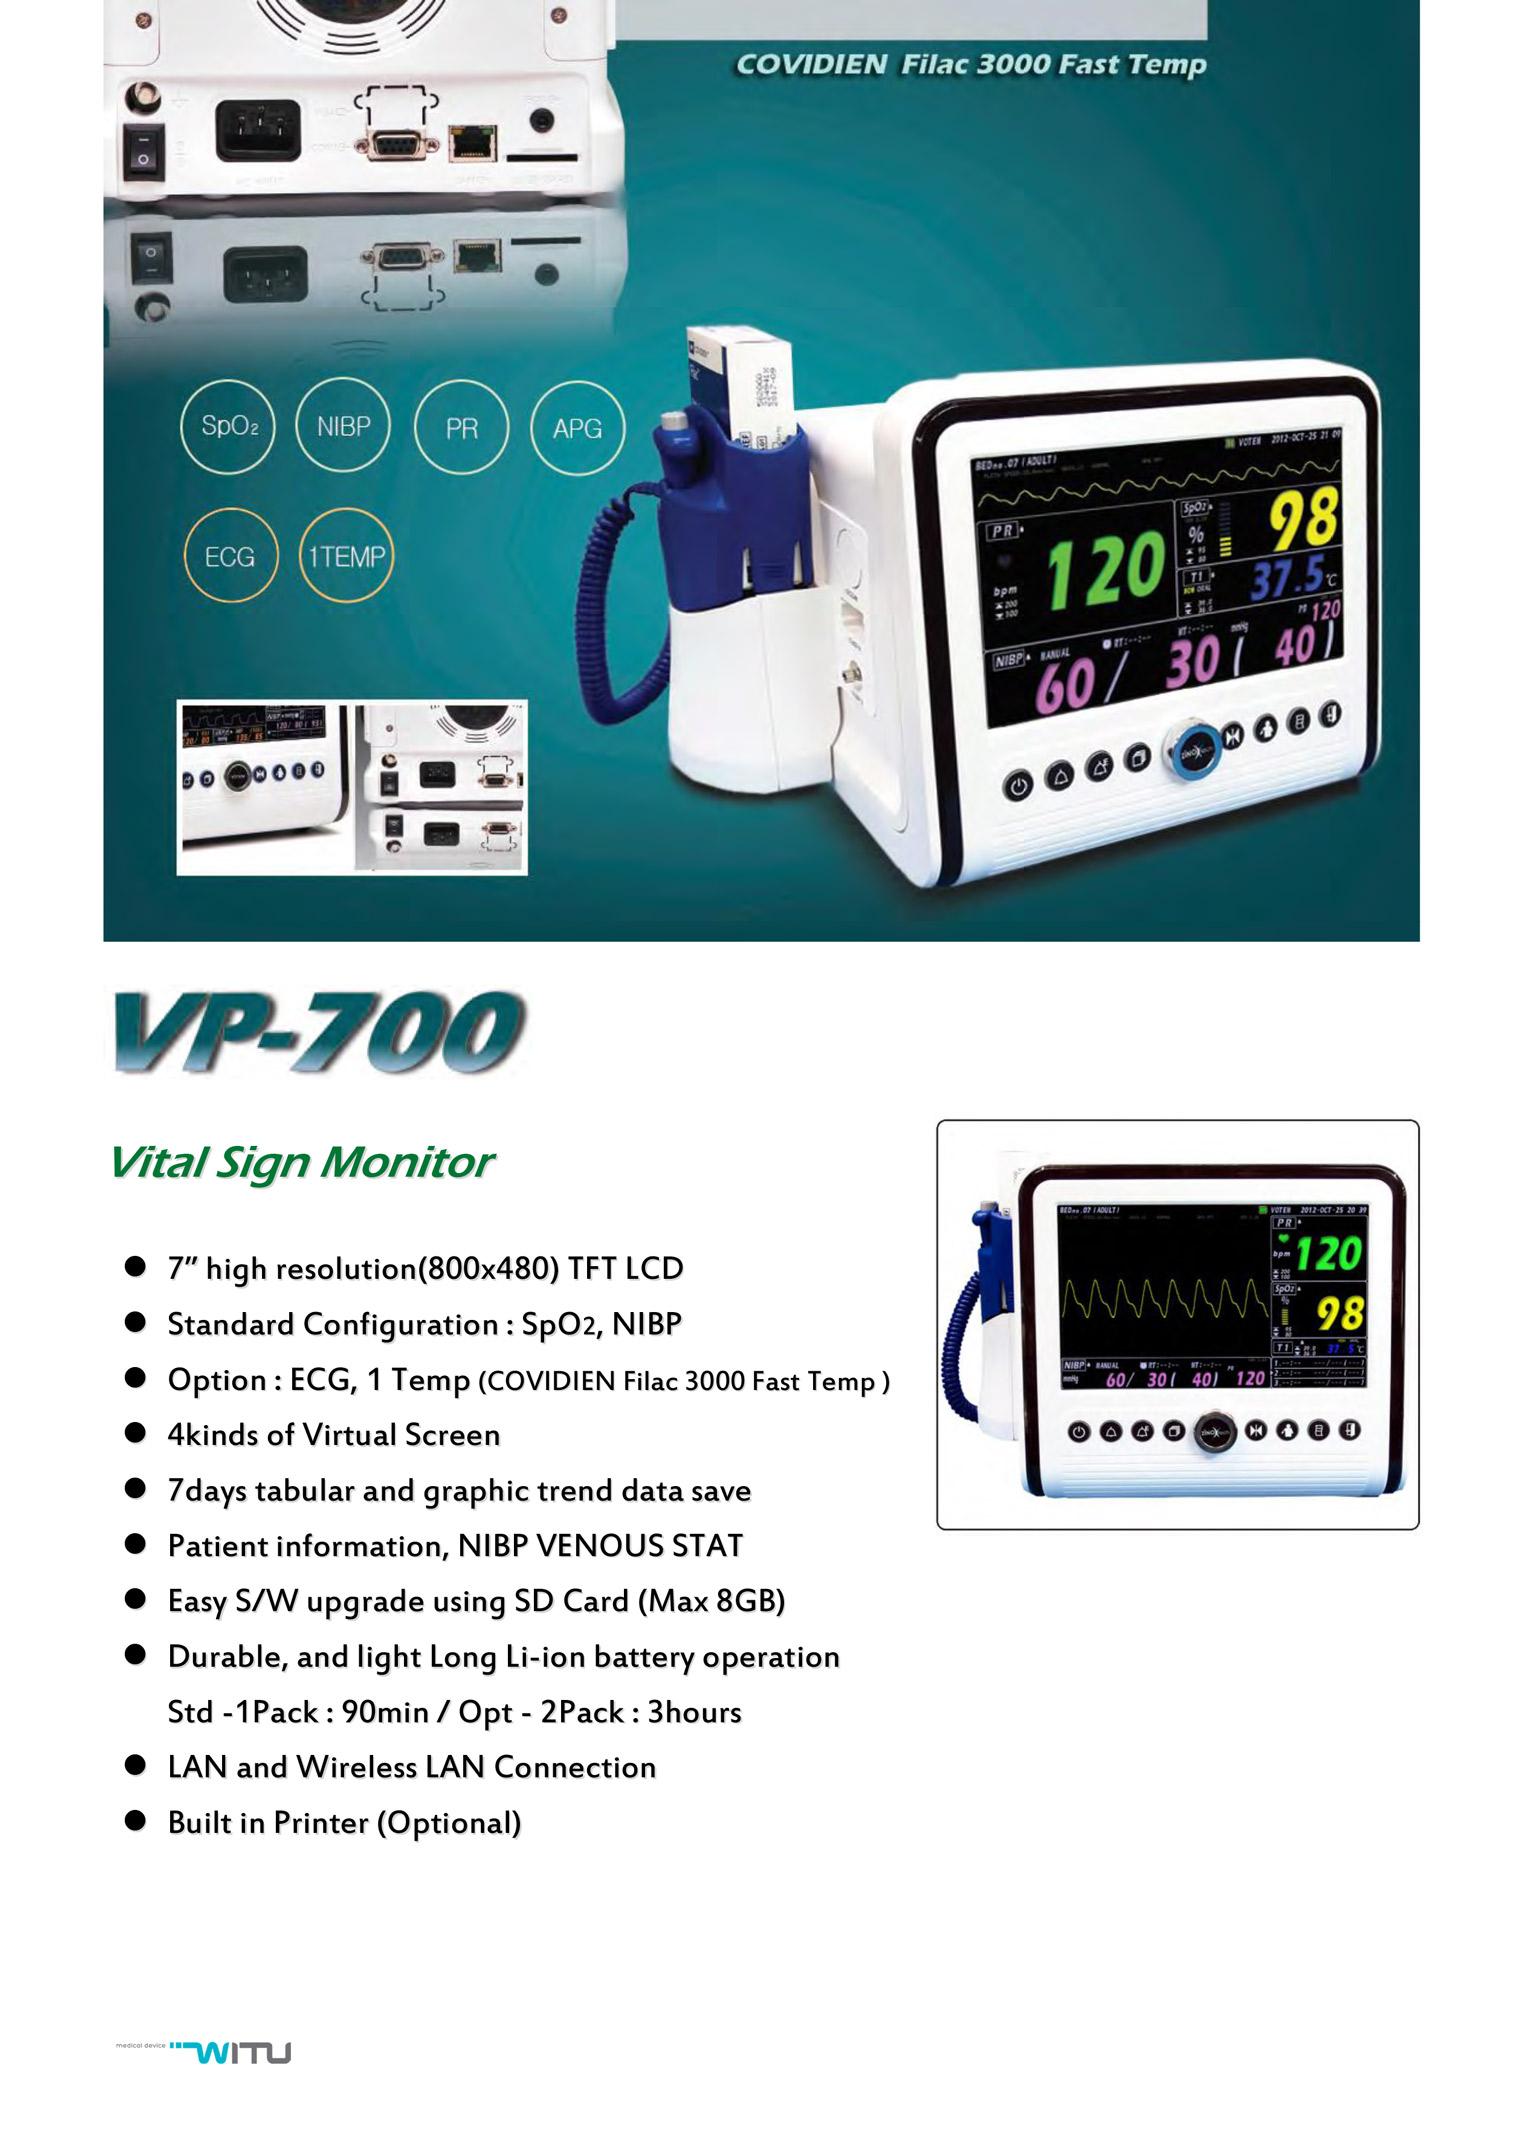 VP-700-SNT_s1.jpg